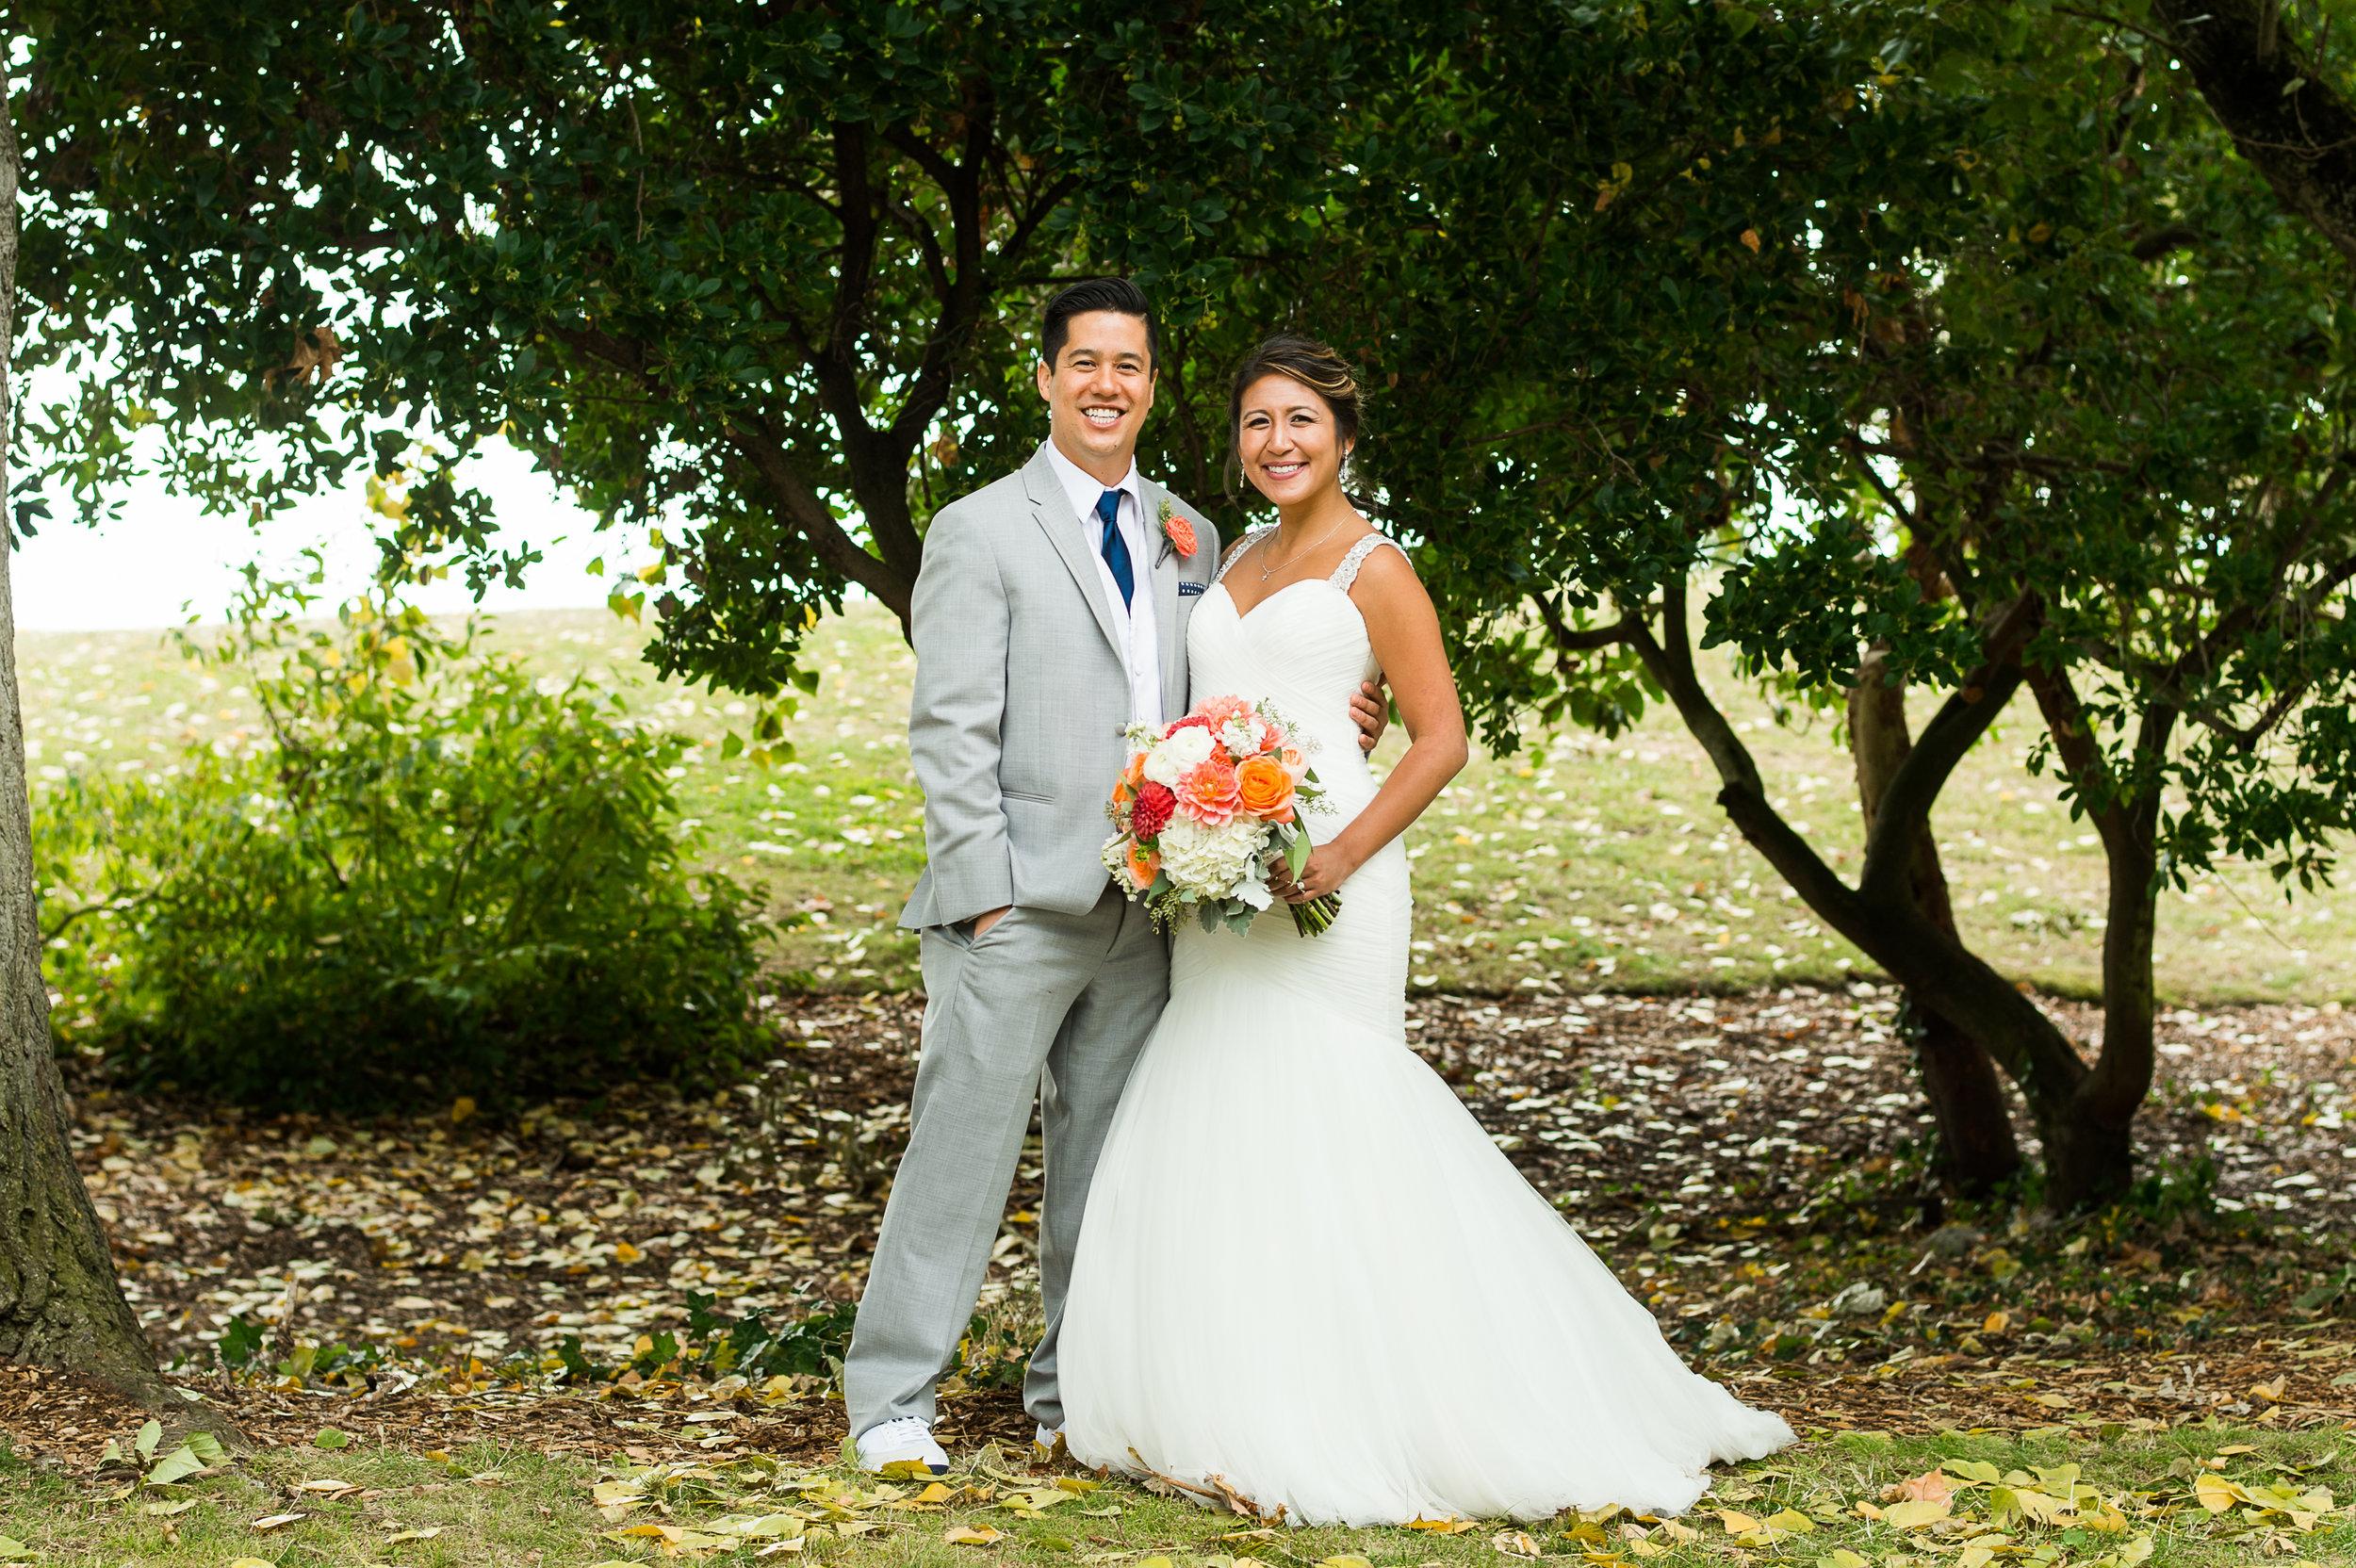 DJ-wedding-Van-Wyhe-Photography-190.jpg